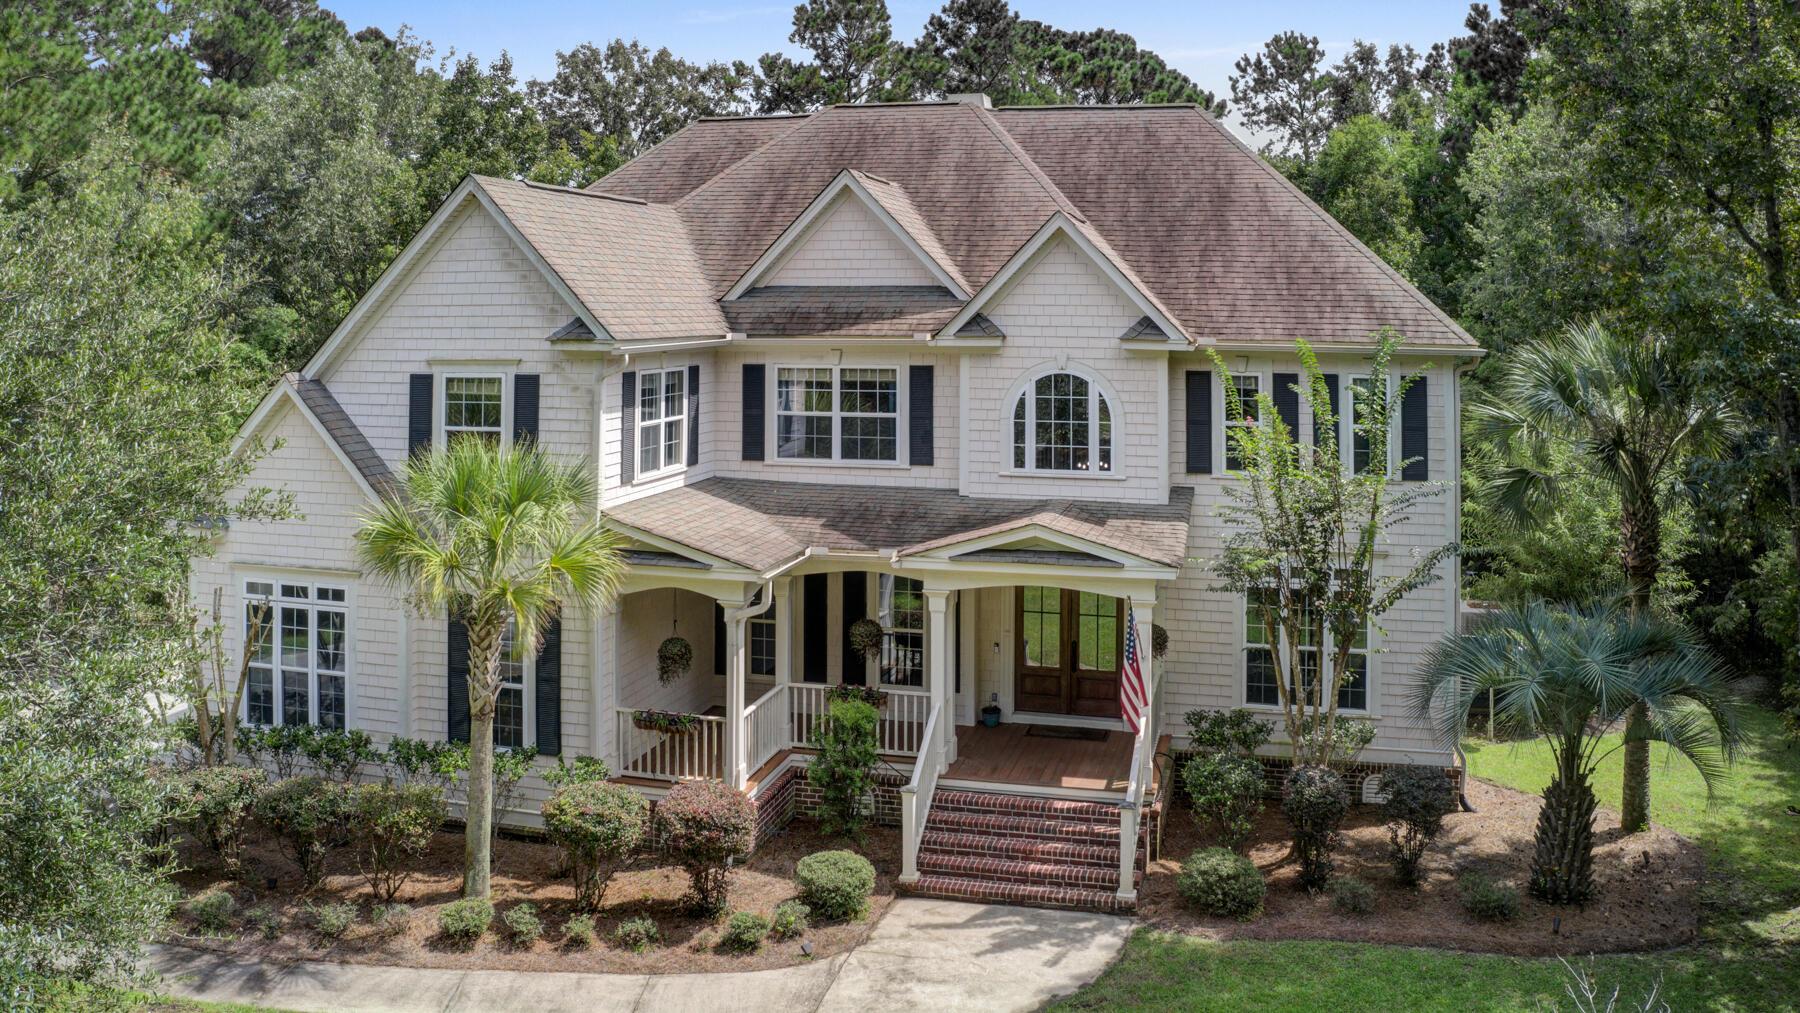 Dunes West Homes For Sale - 3095 Pignatelli, Mount Pleasant, SC - 42